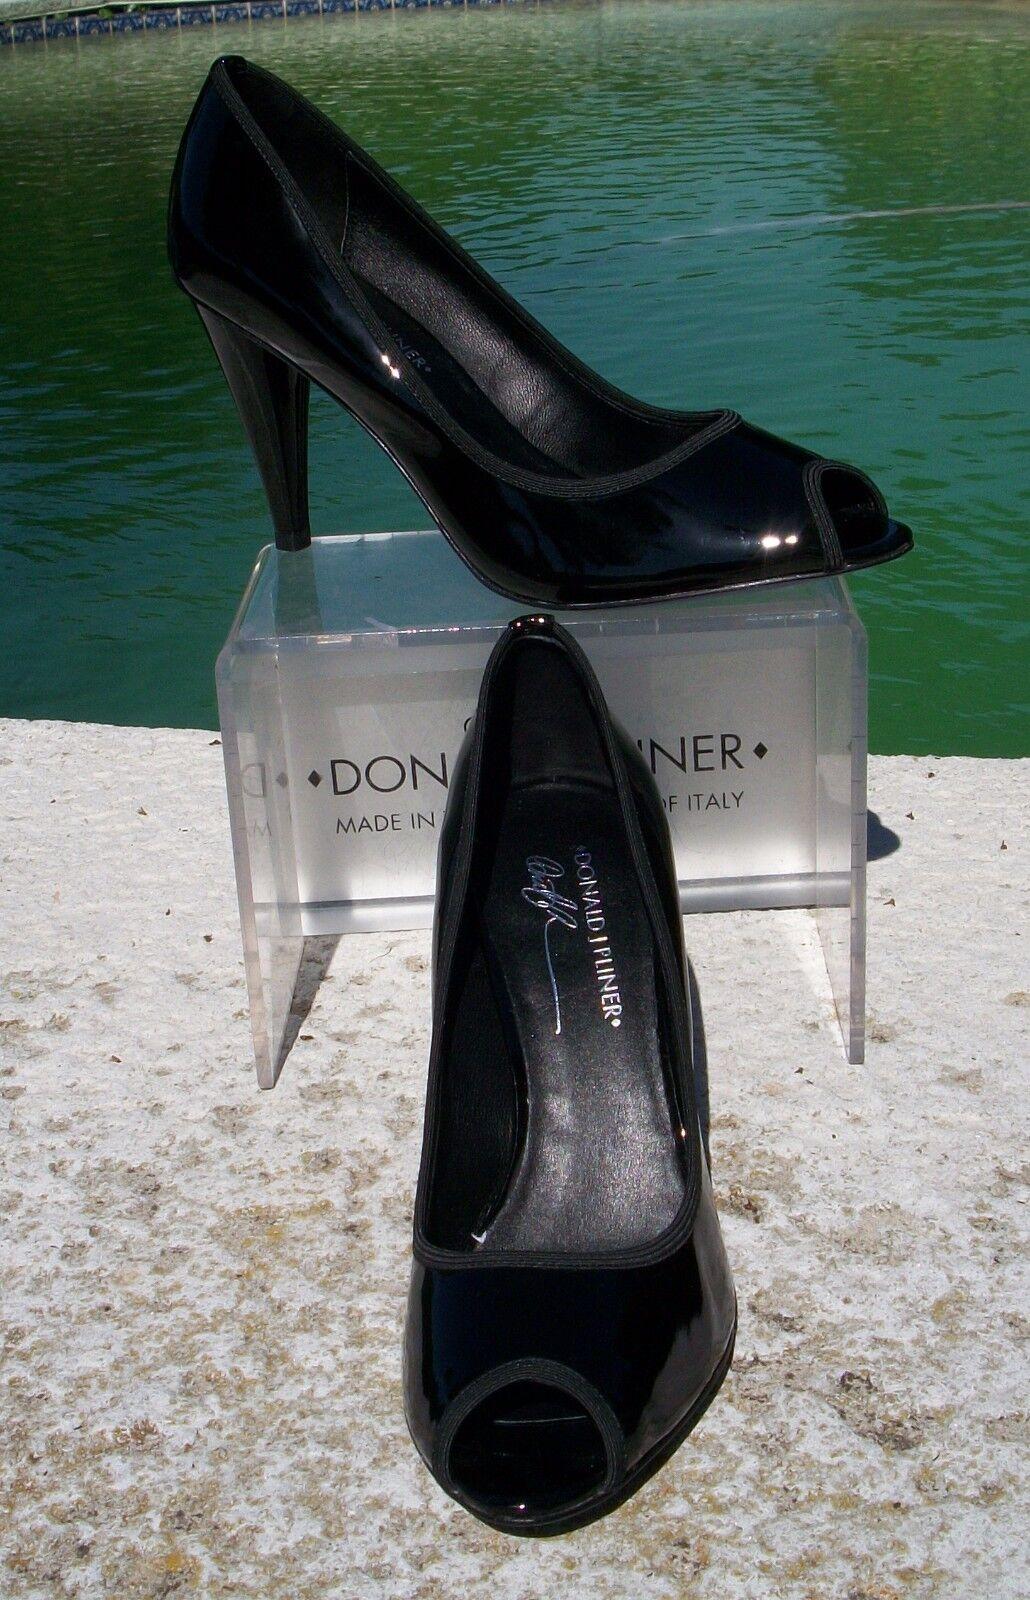 Donald Pliner Couture Kogi Leather Cork schuhe New New New Größe 10 Ankle Strap  295 NIB 7200eb